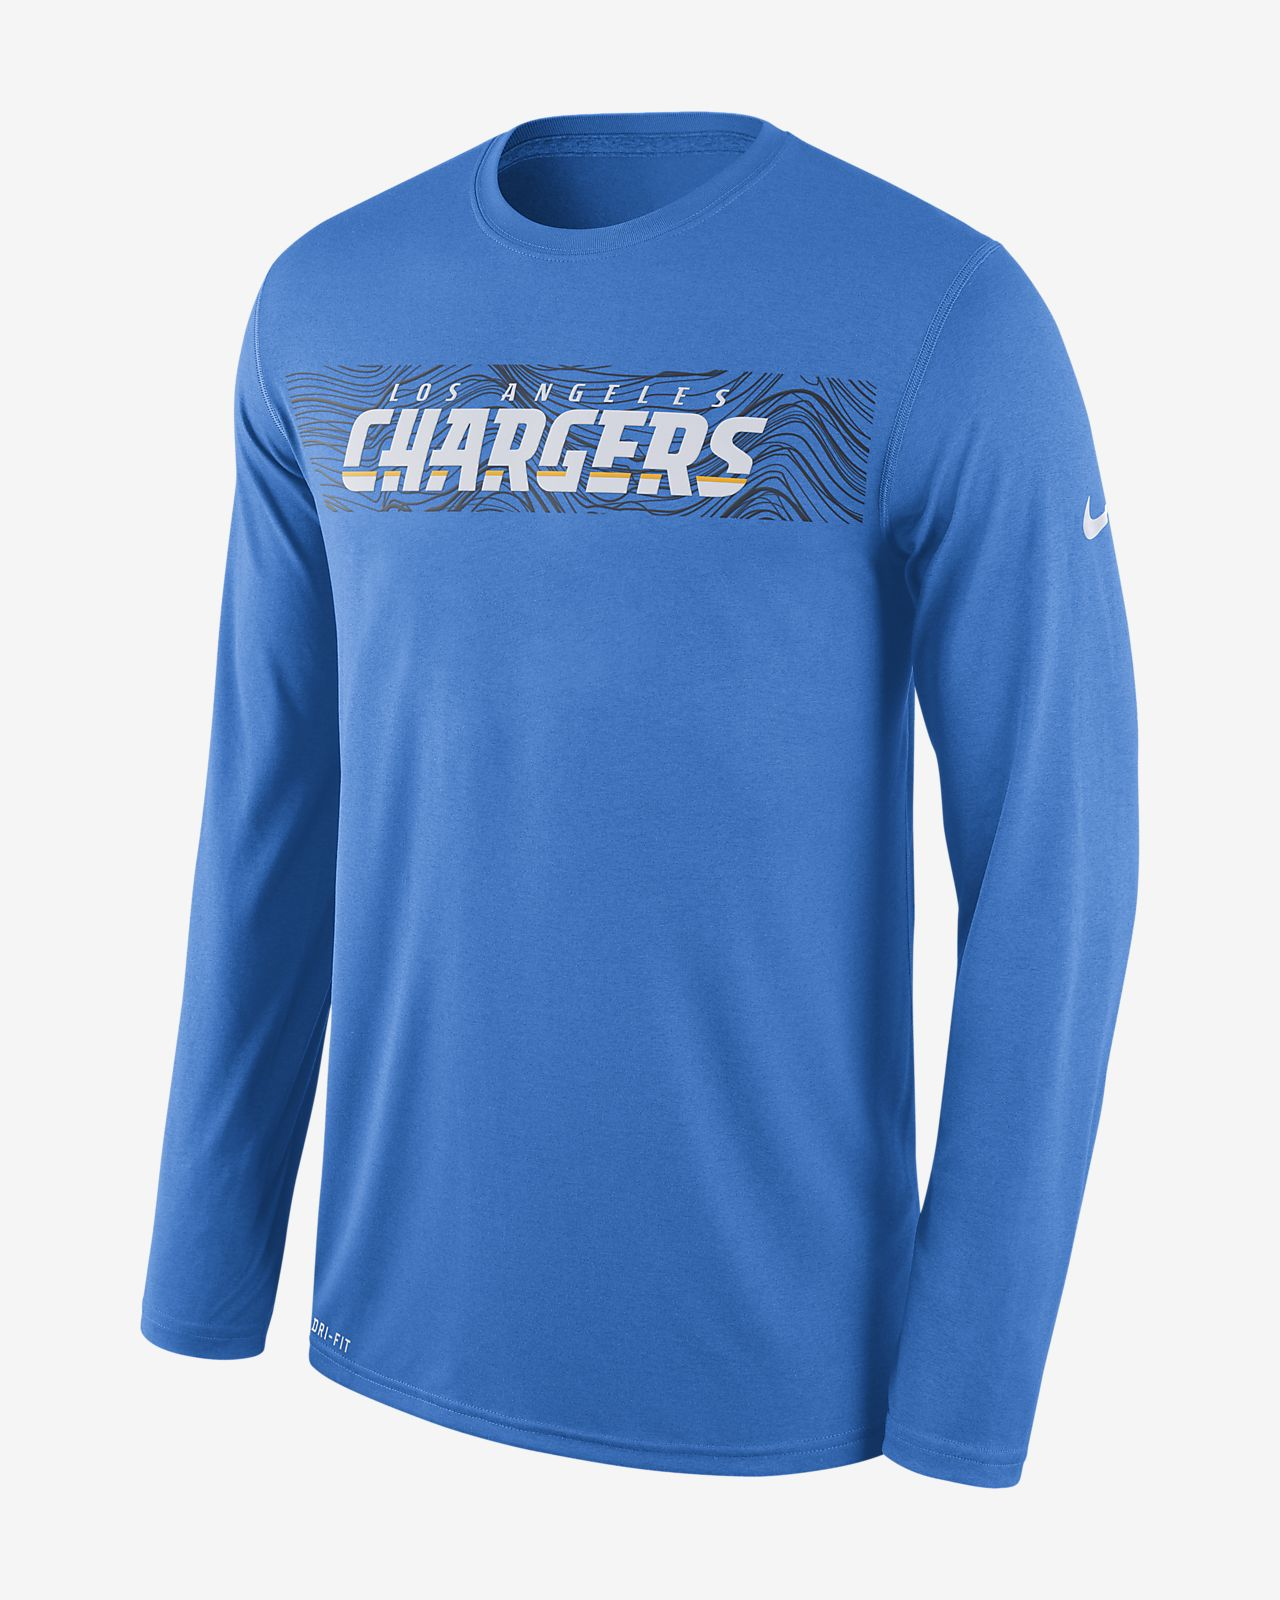 Nike Dri-FIT Legend Seismic (NFL Chargers) Men s Long Sleeve T-Shirt ... 1785471a13f